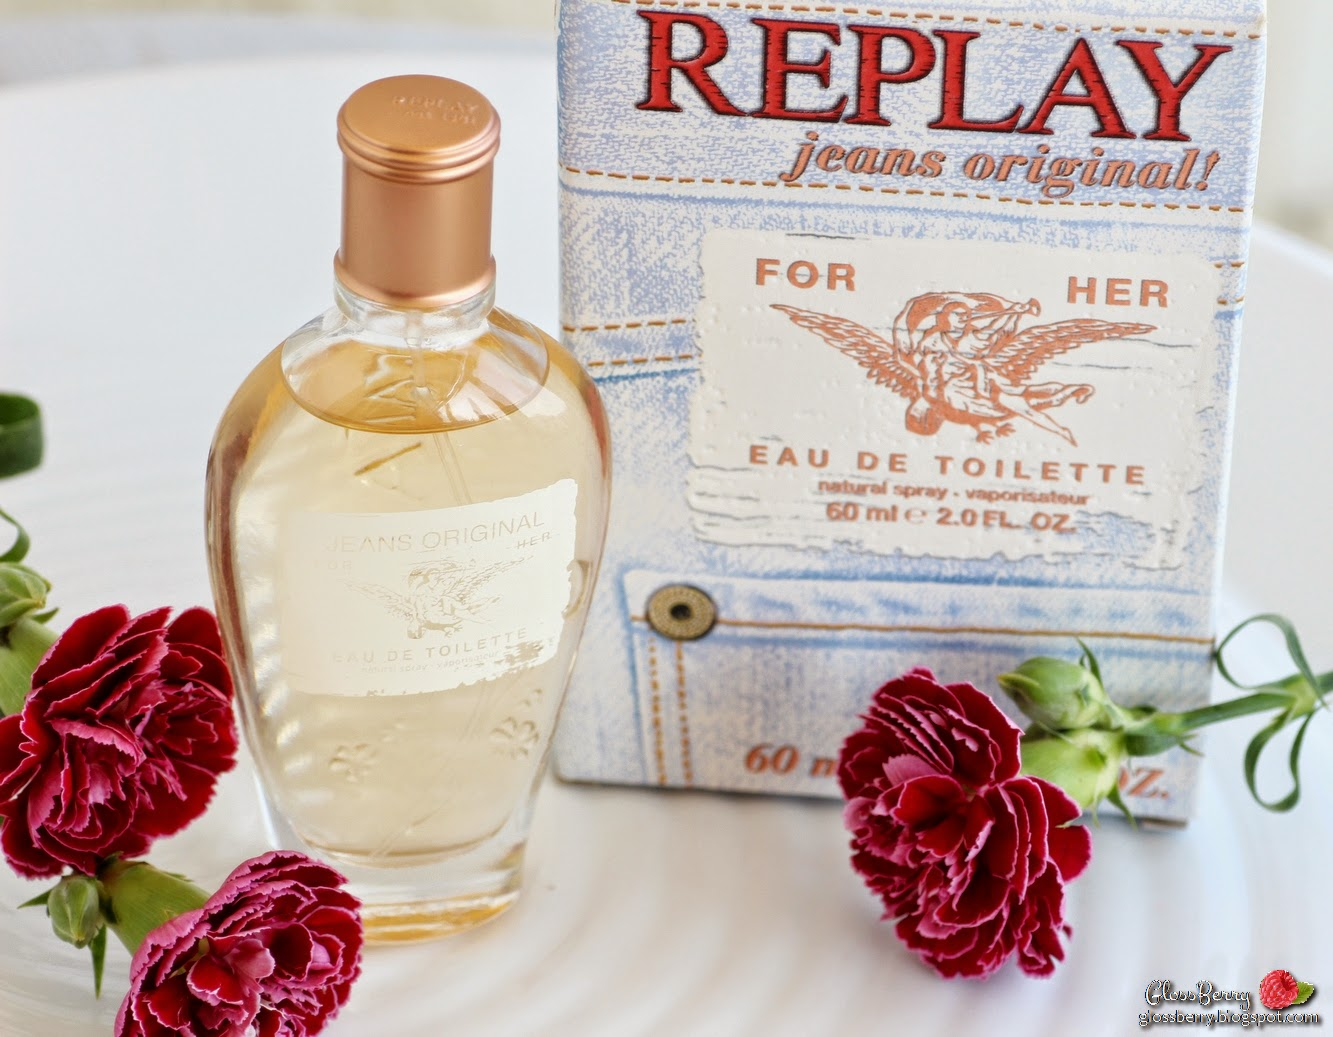 replay original jeans perfume edt review סקירה בושם ריפליי אוריג'ינל ג'ינס for her גלוסברי בלוג beauty blog glossberry